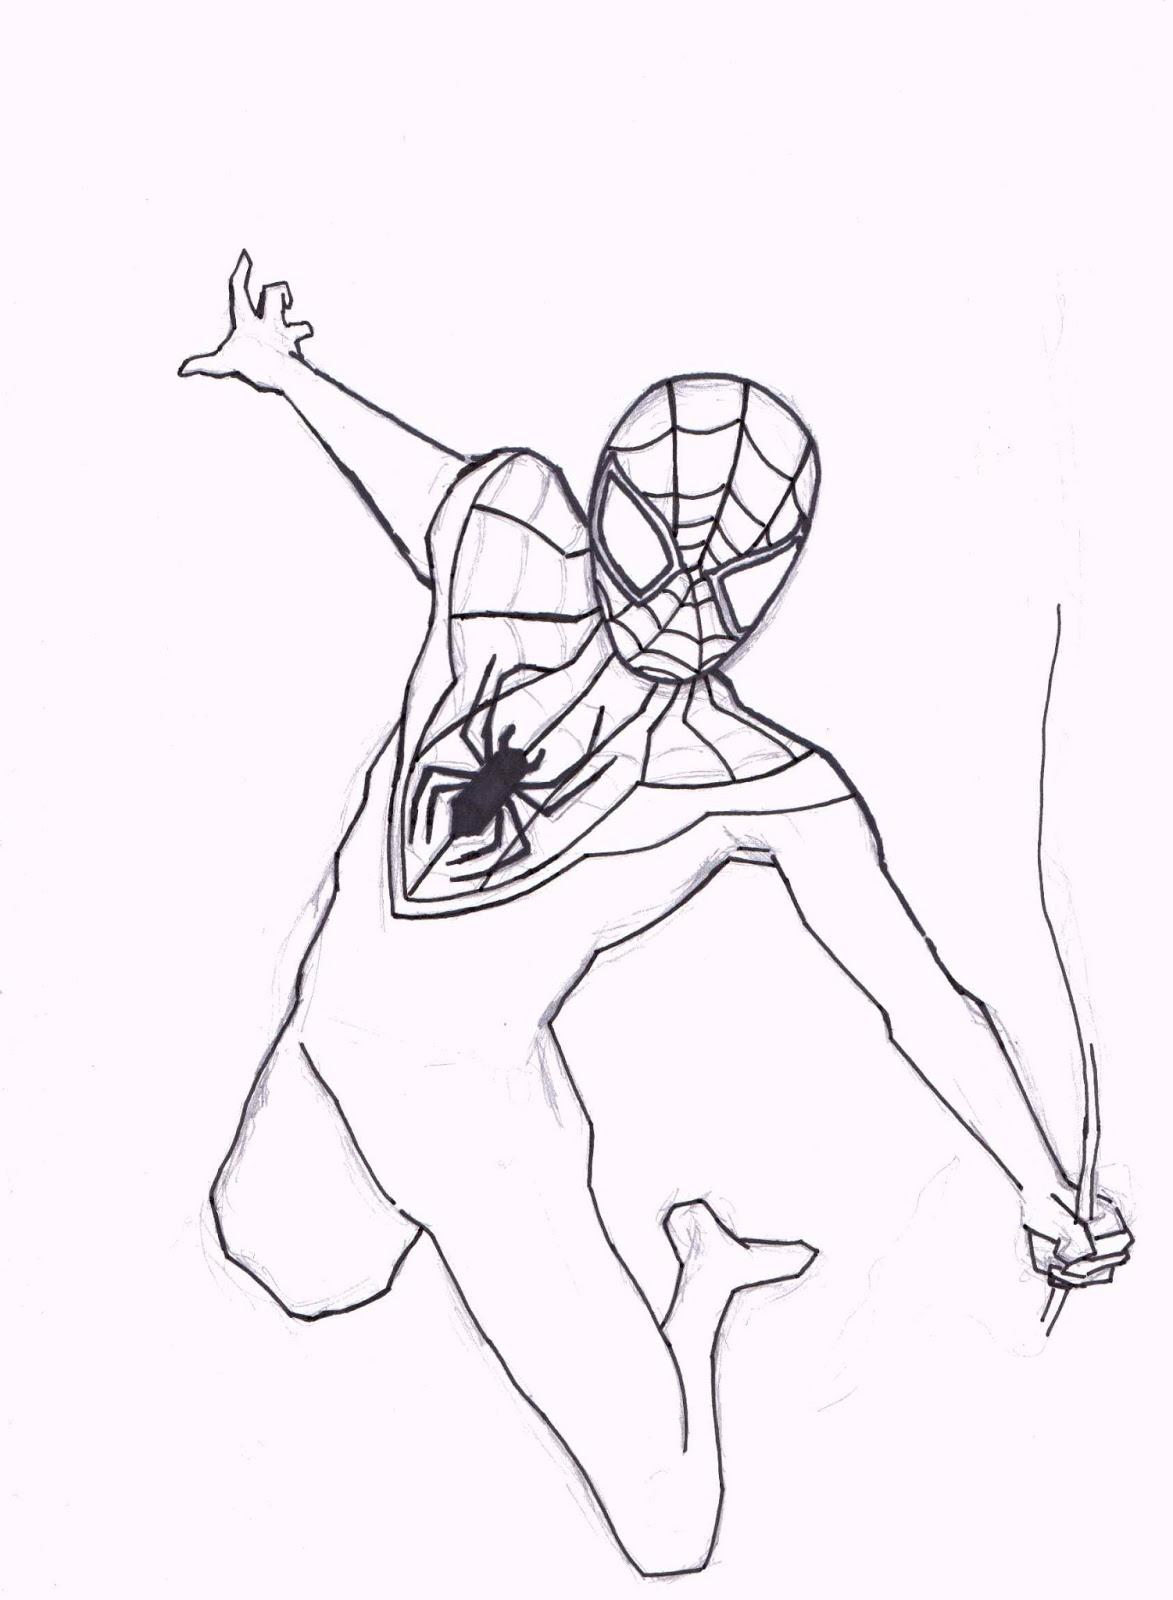 John Graham Comic Blog: Work In Progress: Ultimate Spider-Man